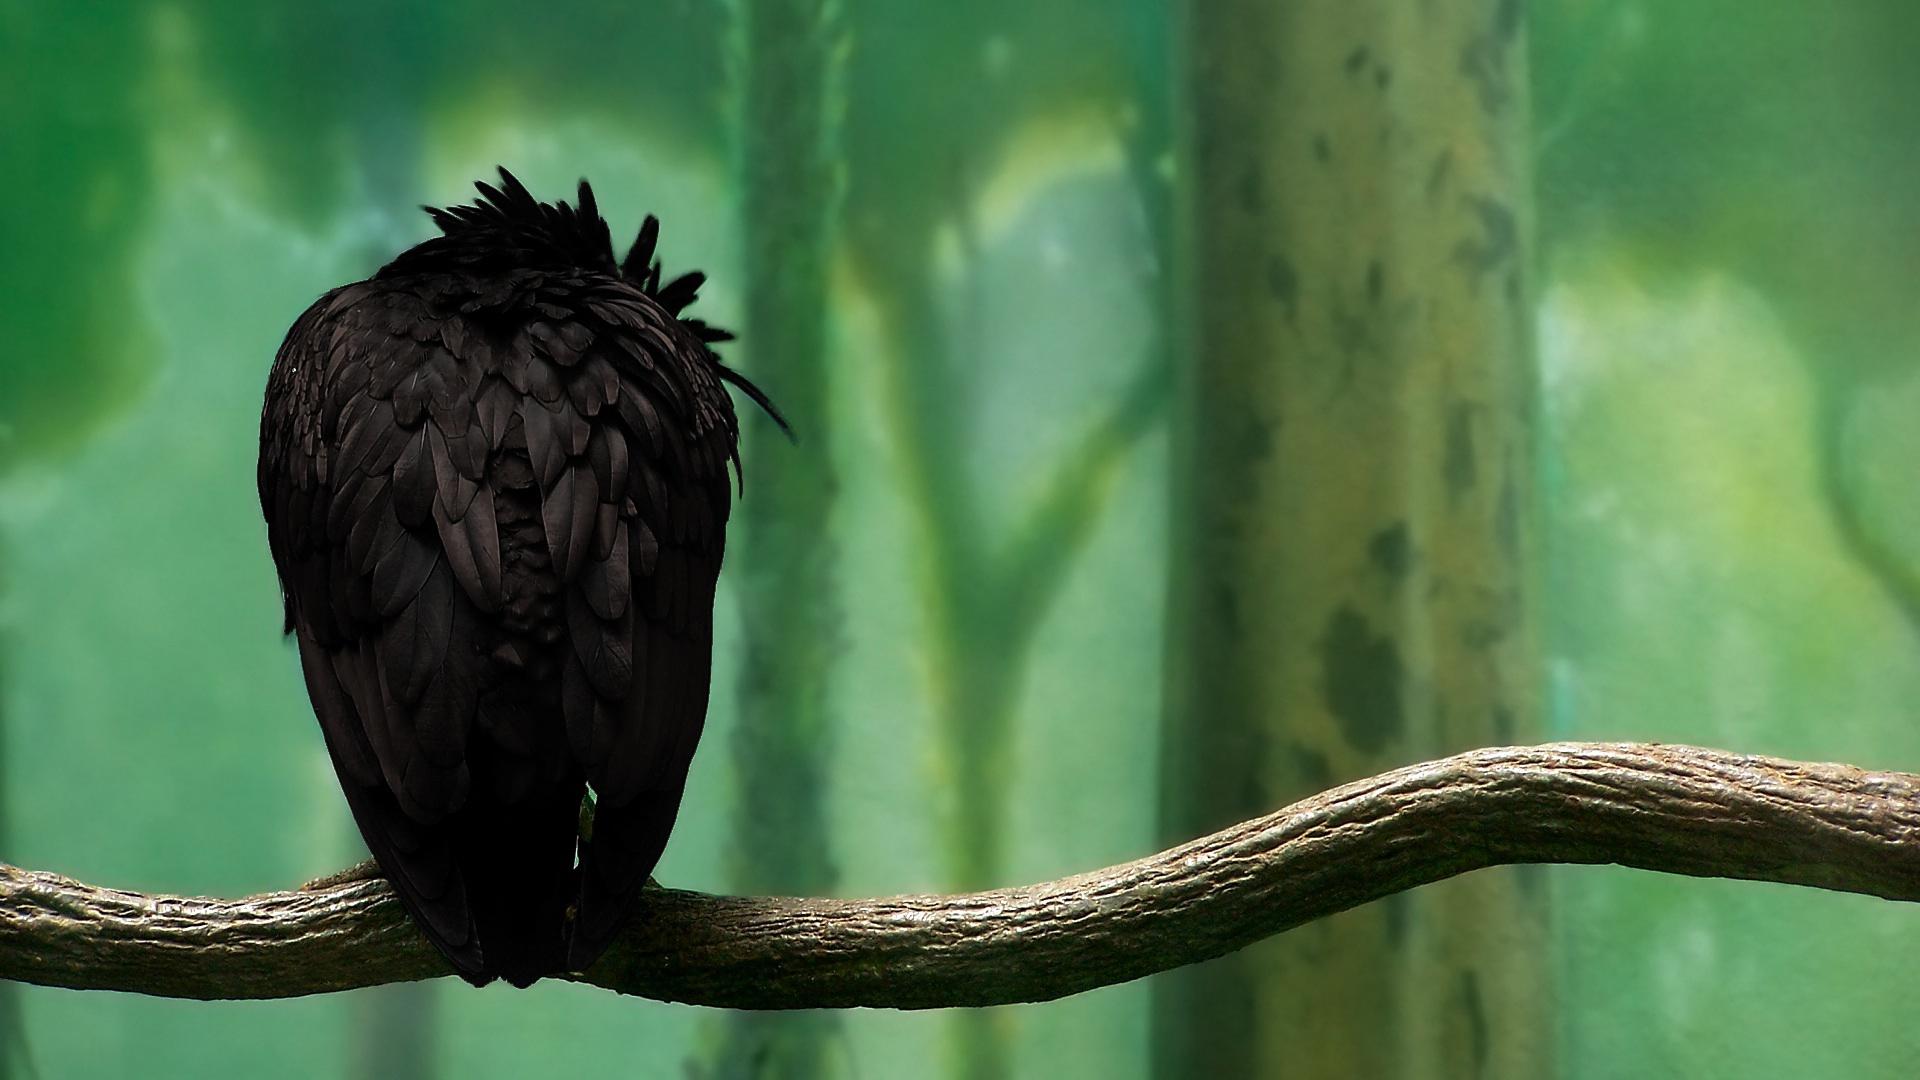 Crow 1920x1080